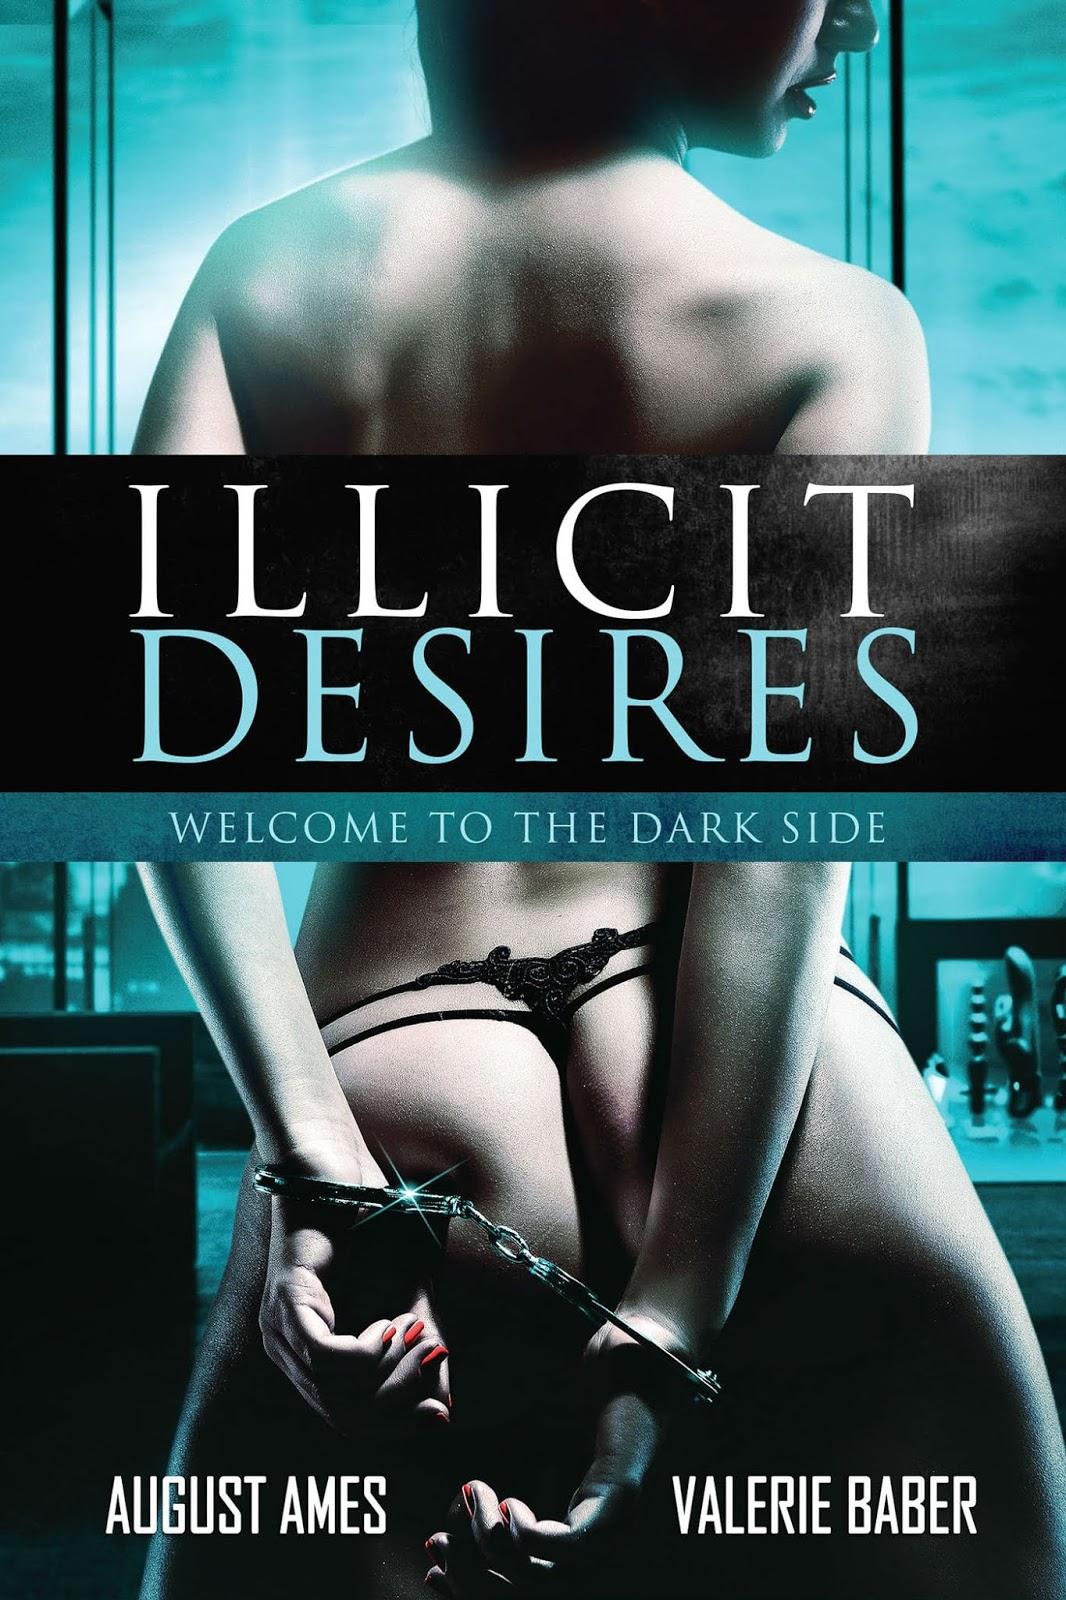 Illicit Desires Full USA 18+ Adult Movie Online Free